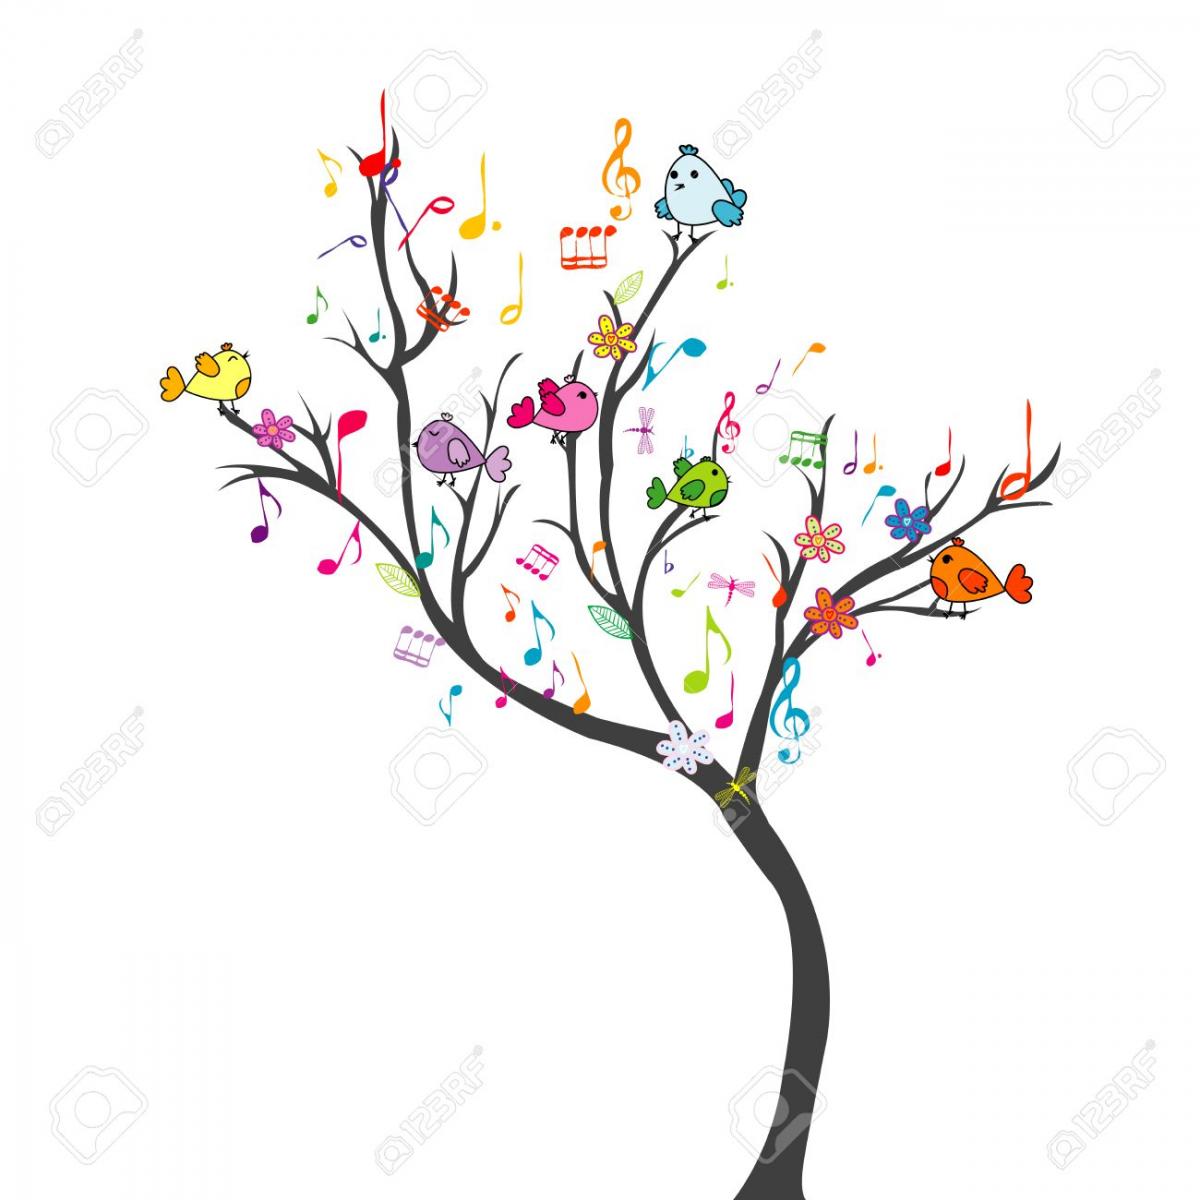 43eac59bc Monday Twitter Tree - Artisan Handmade - April 1, 2019